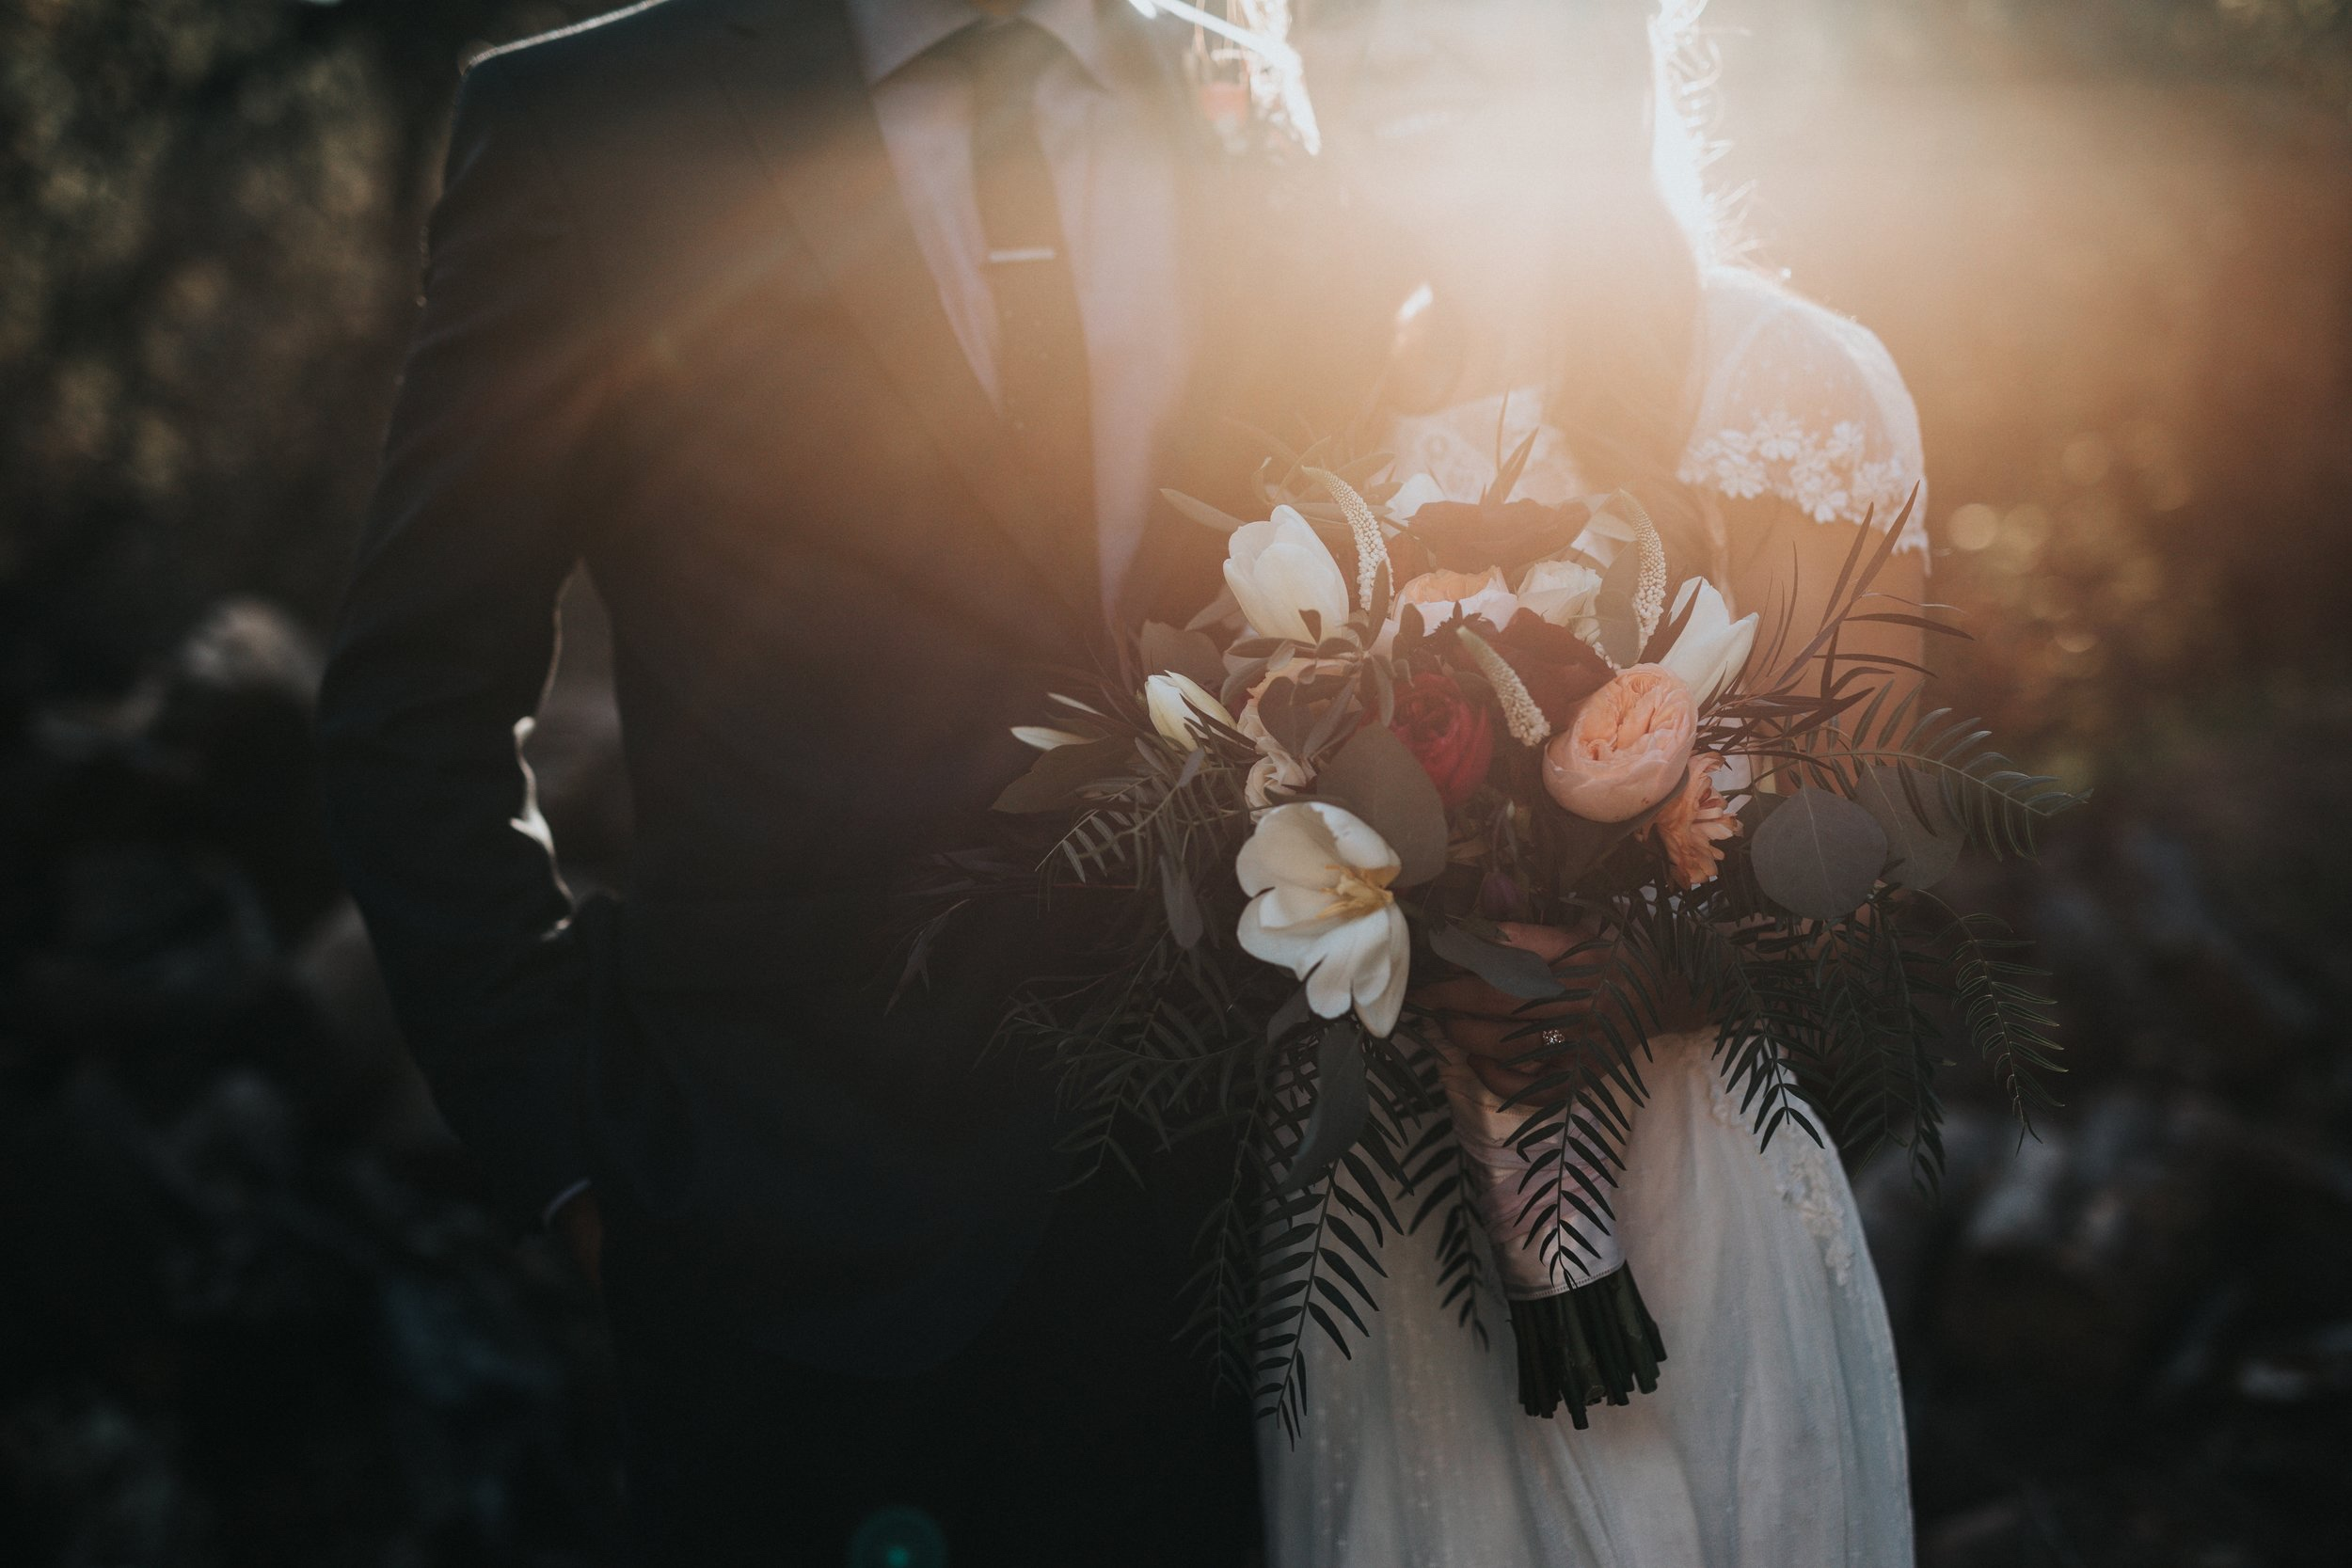 rochester-ny-premarital-counseling.jpg